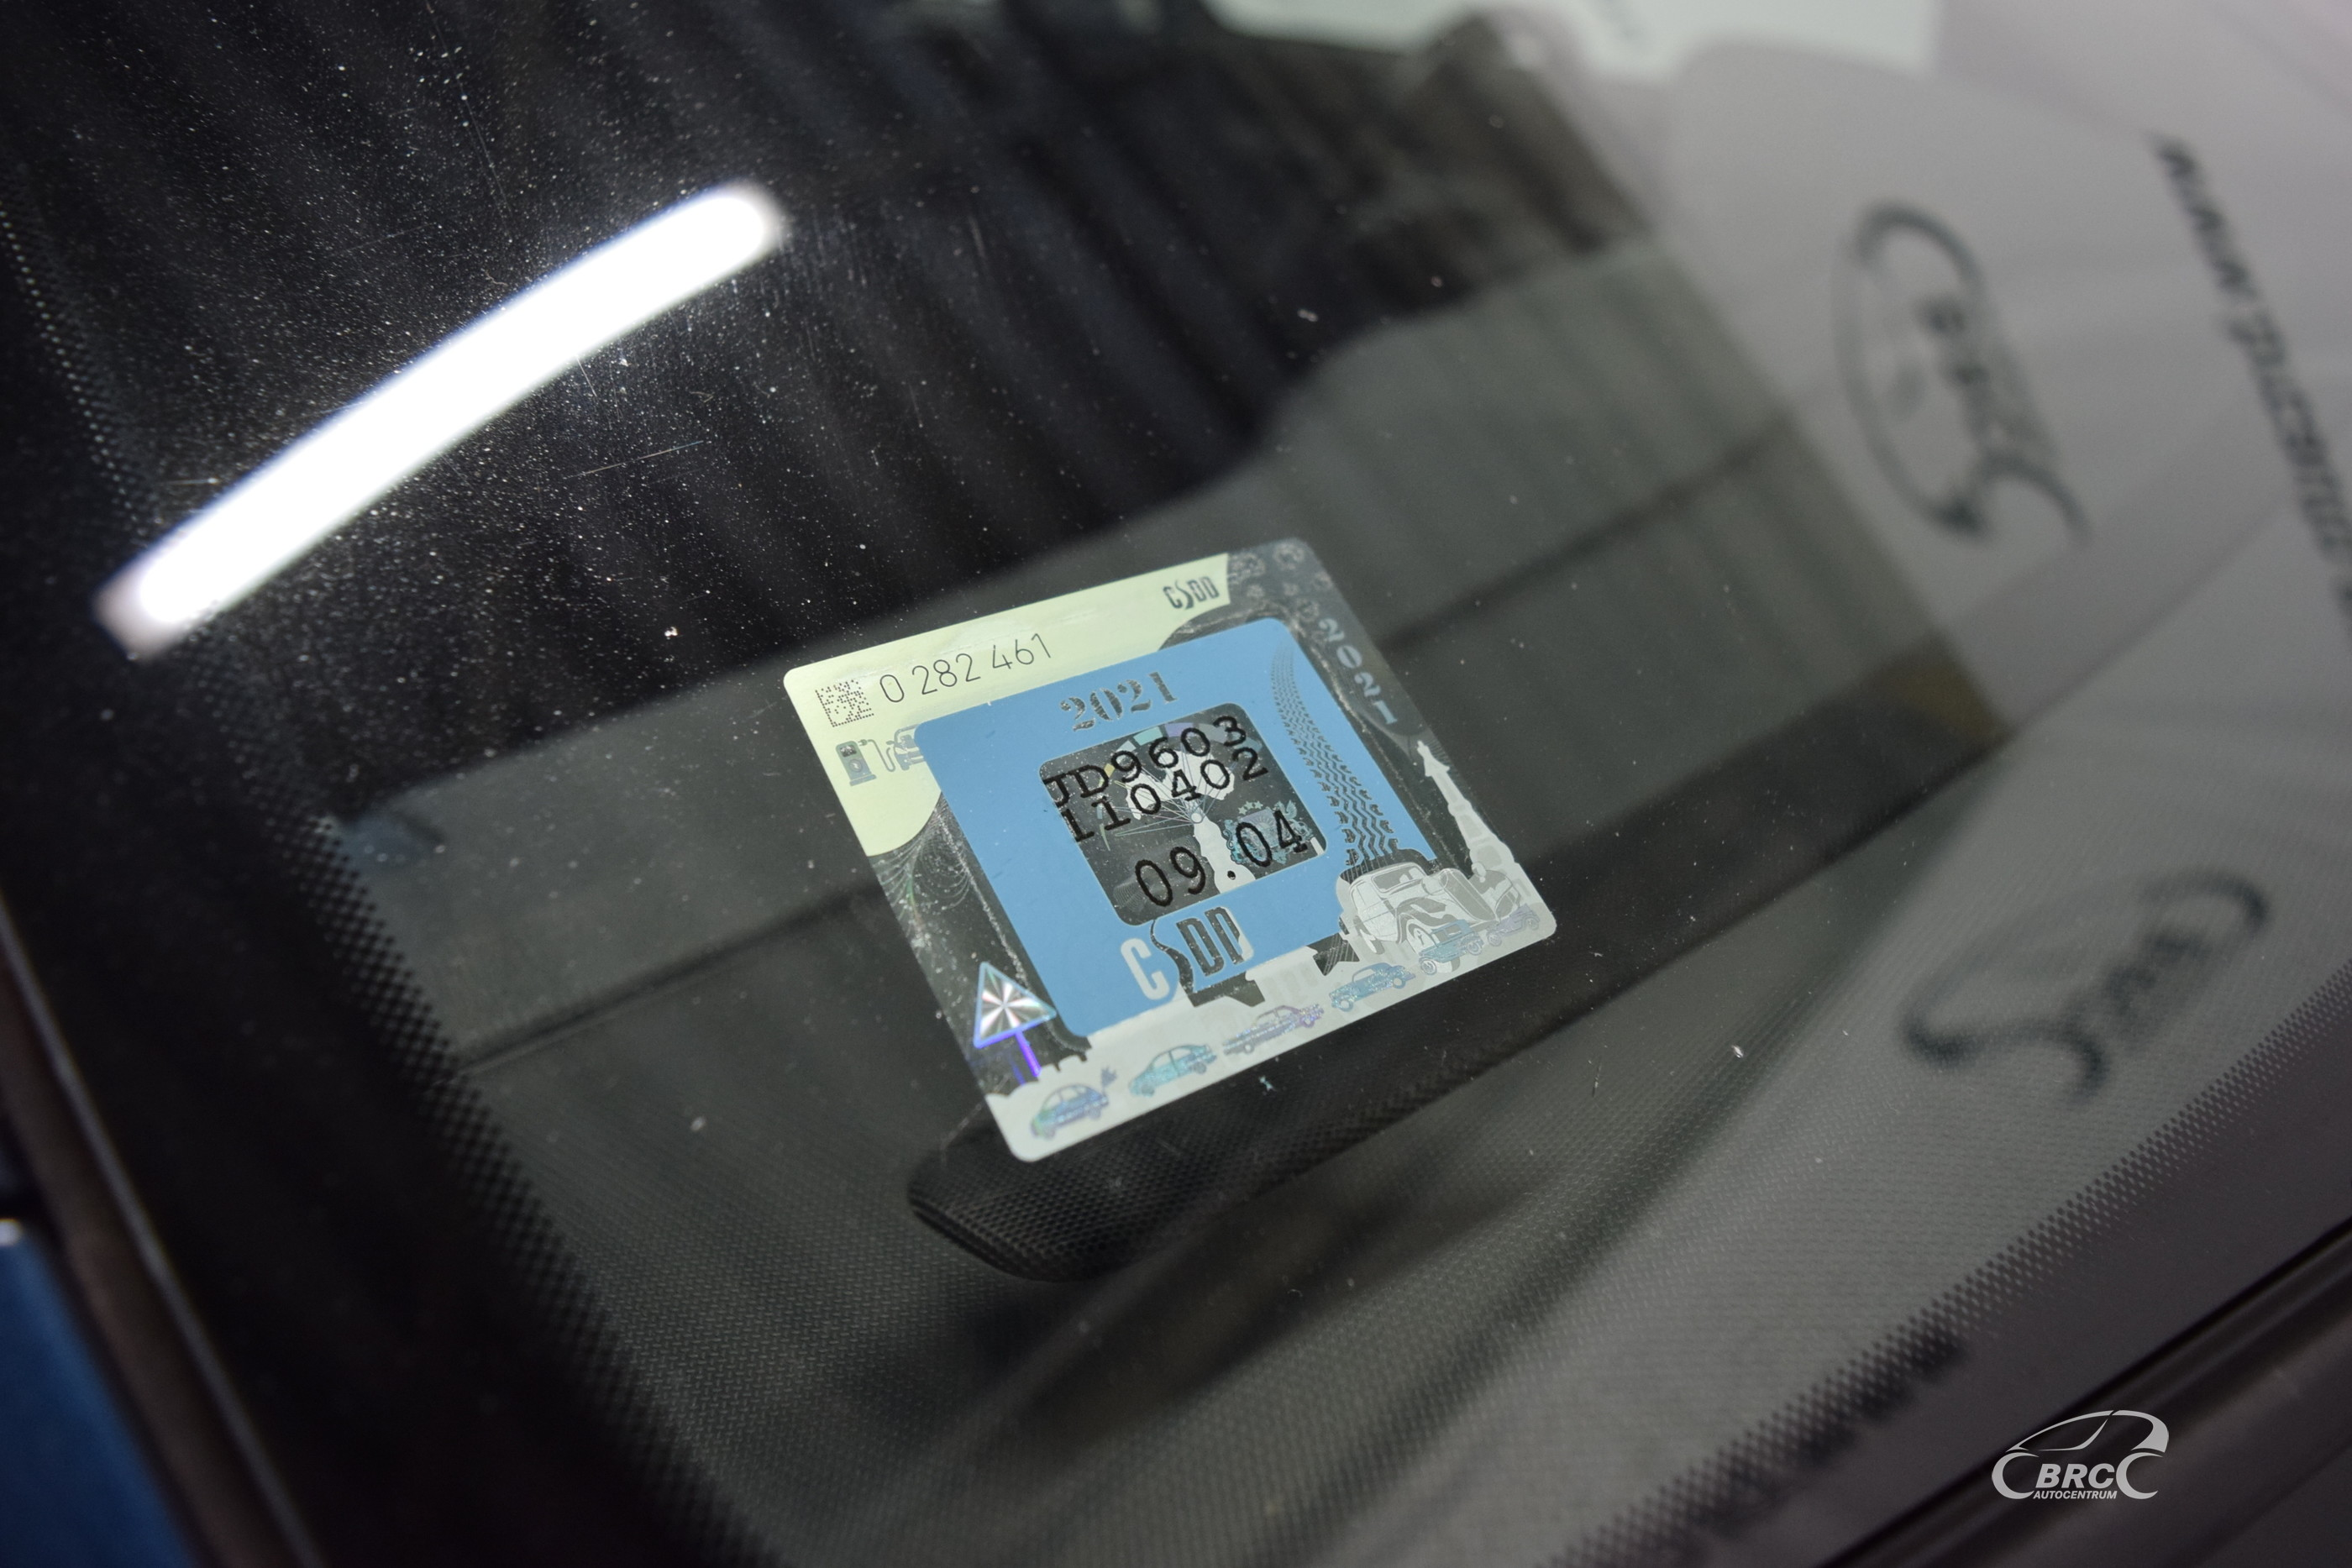 Skoda Octavia TDi M/T